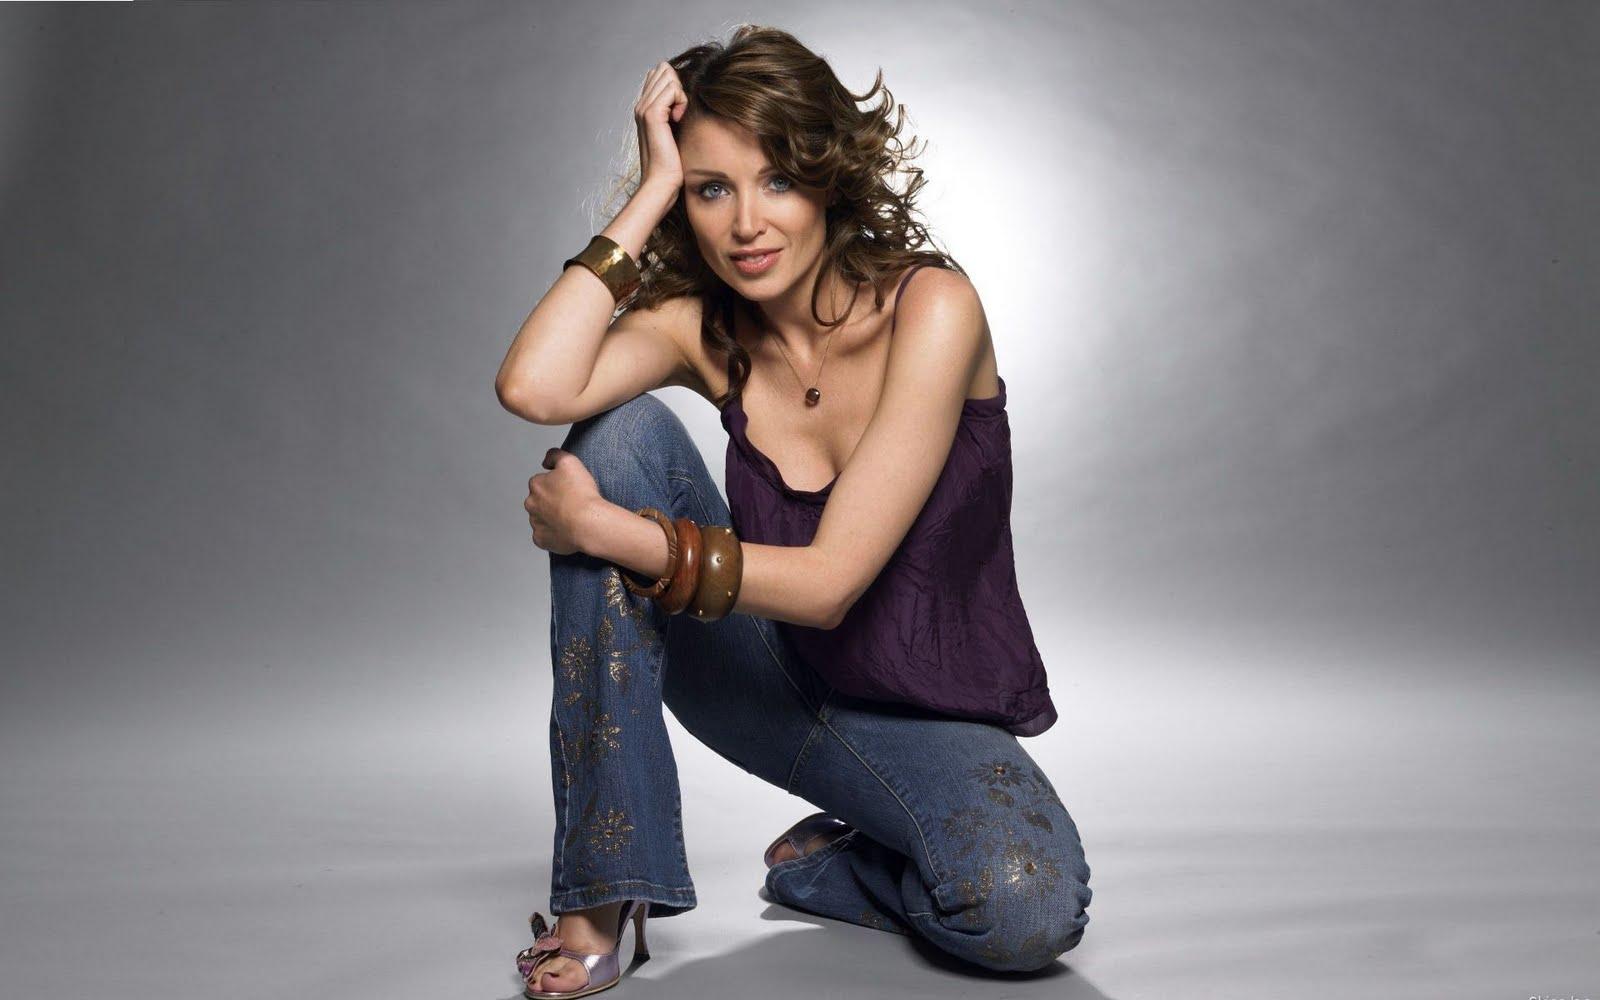 http://4.bp.blogspot.com/_cZuaghvCasw/TAdg0UgF6AI/AAAAAAAAGCY/pPU4JK3hKSU/s1600/Dannii-Minogue.jpg